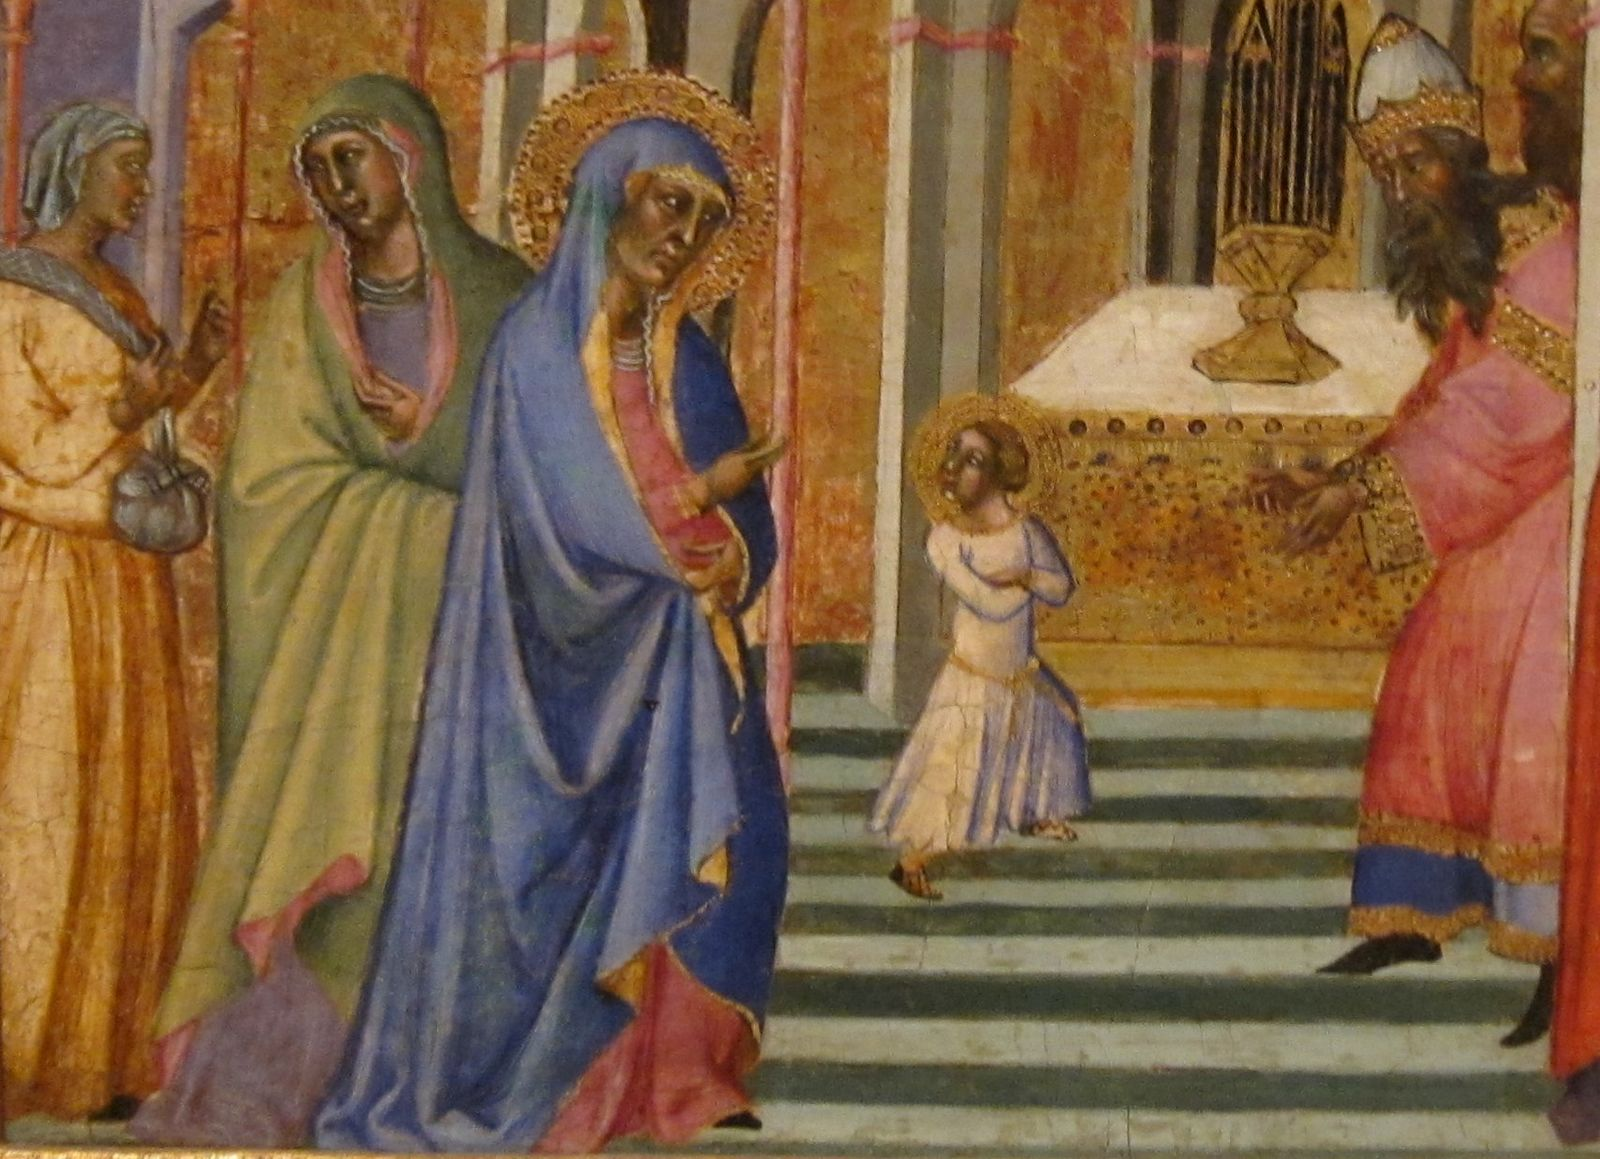 Maria catalina los angeles - 1 part 8